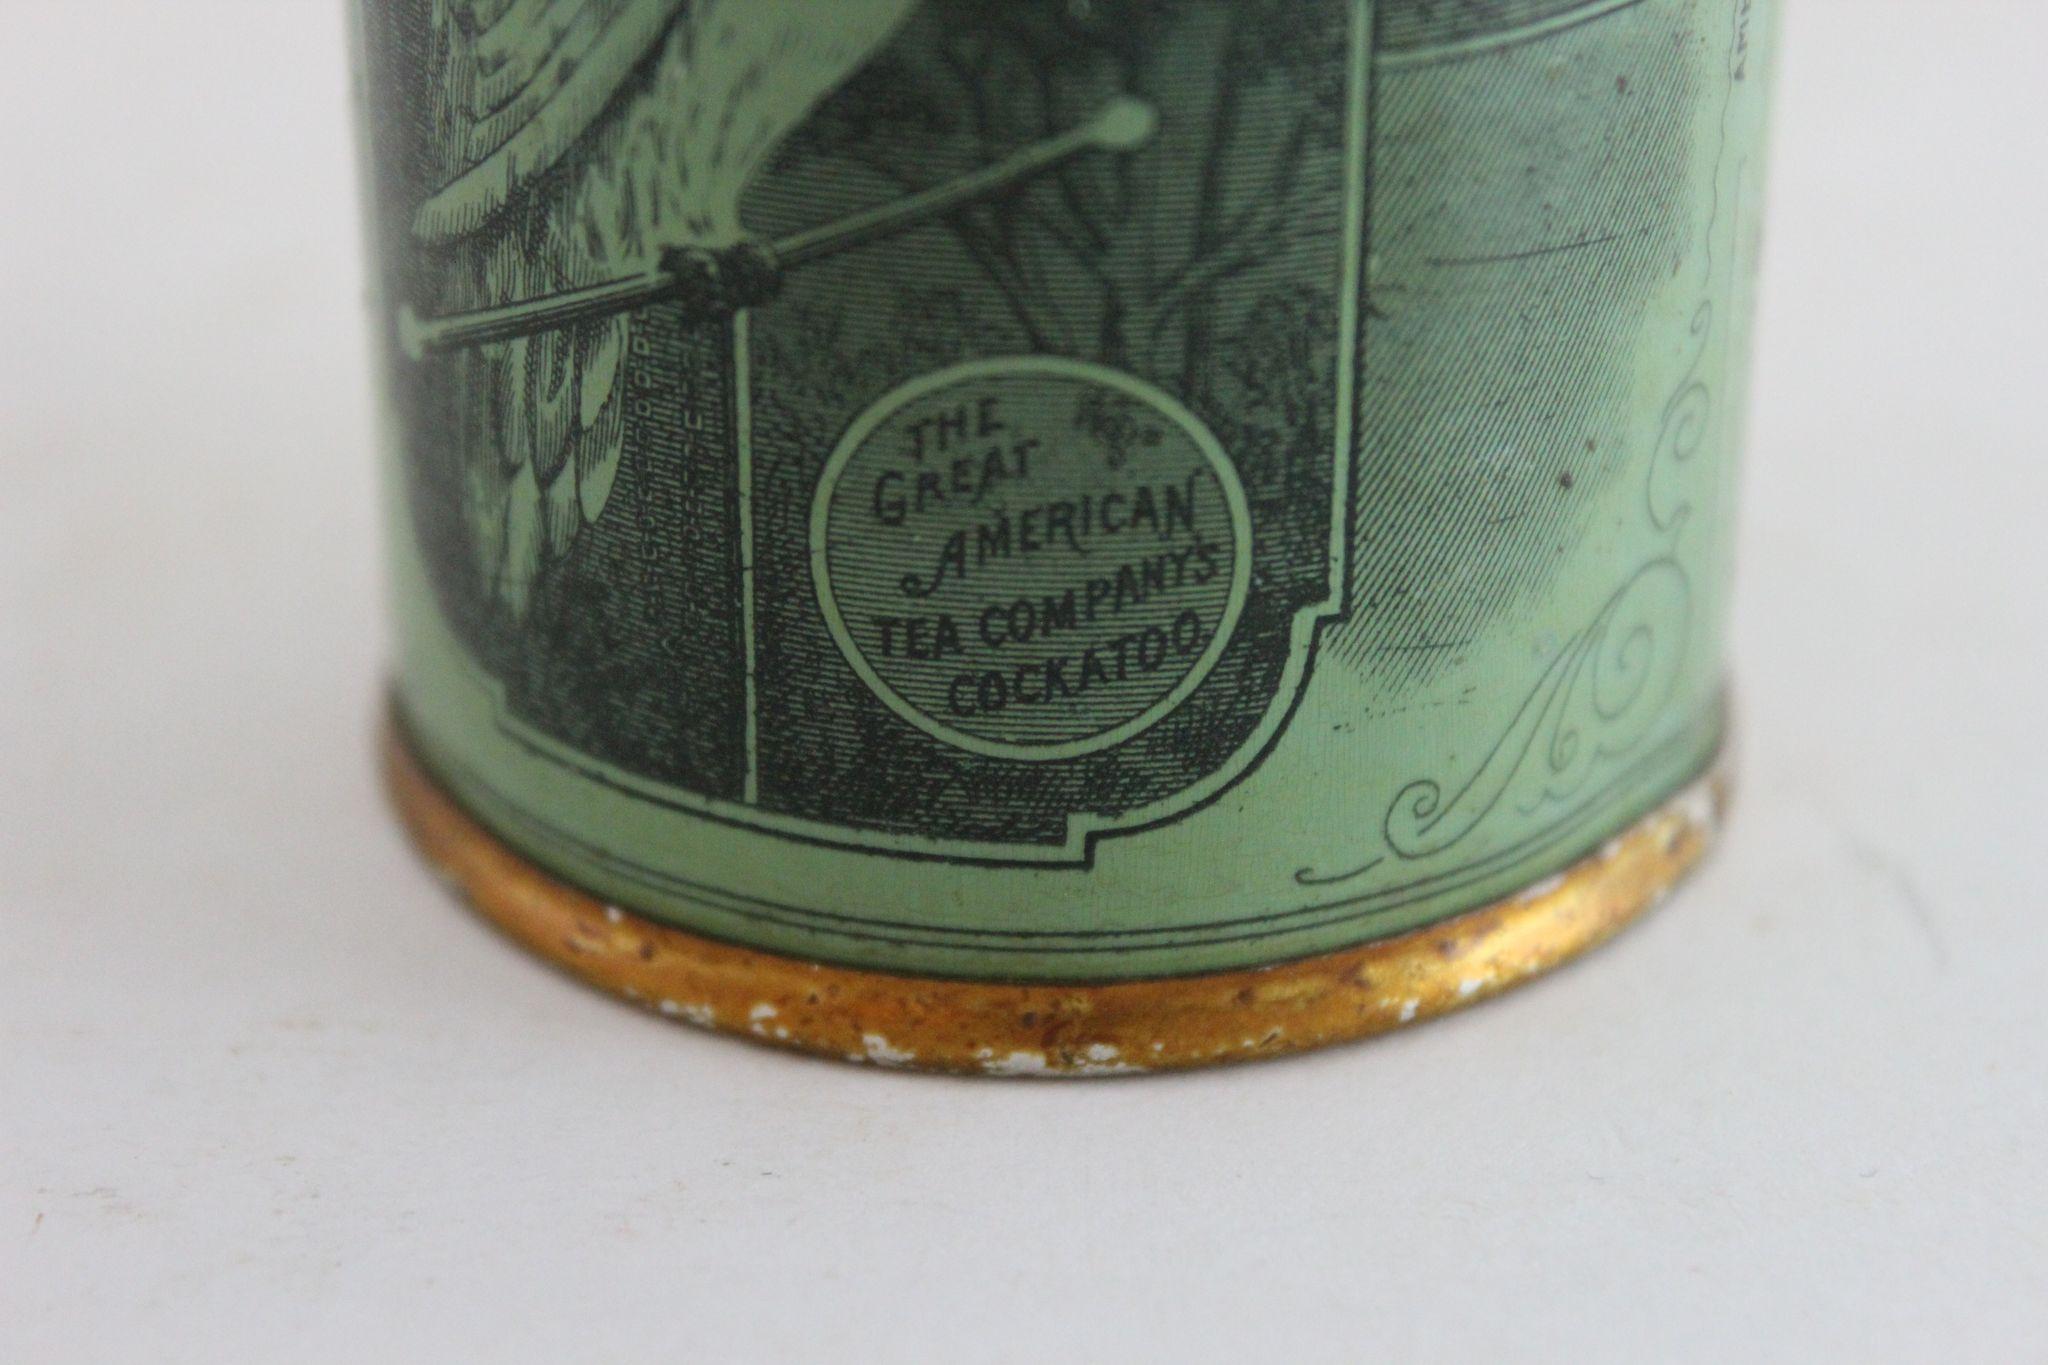 Great American Tea Company Cinnamon Spice Tin From